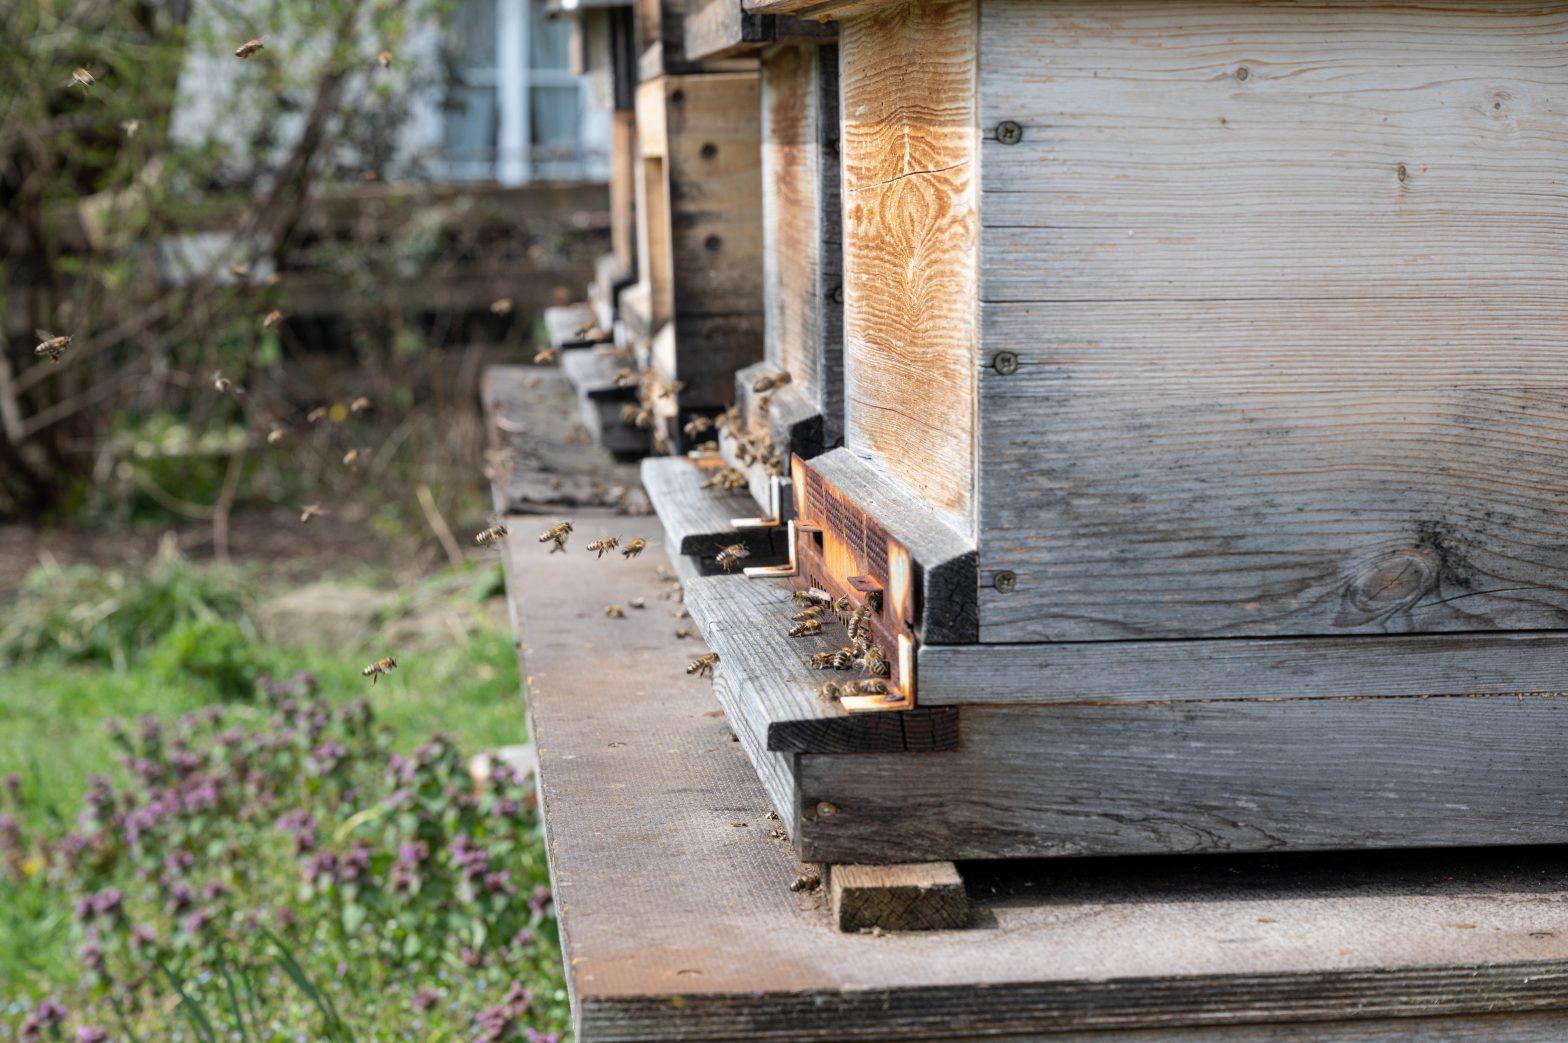 Flugbetrieb am Bienenstand